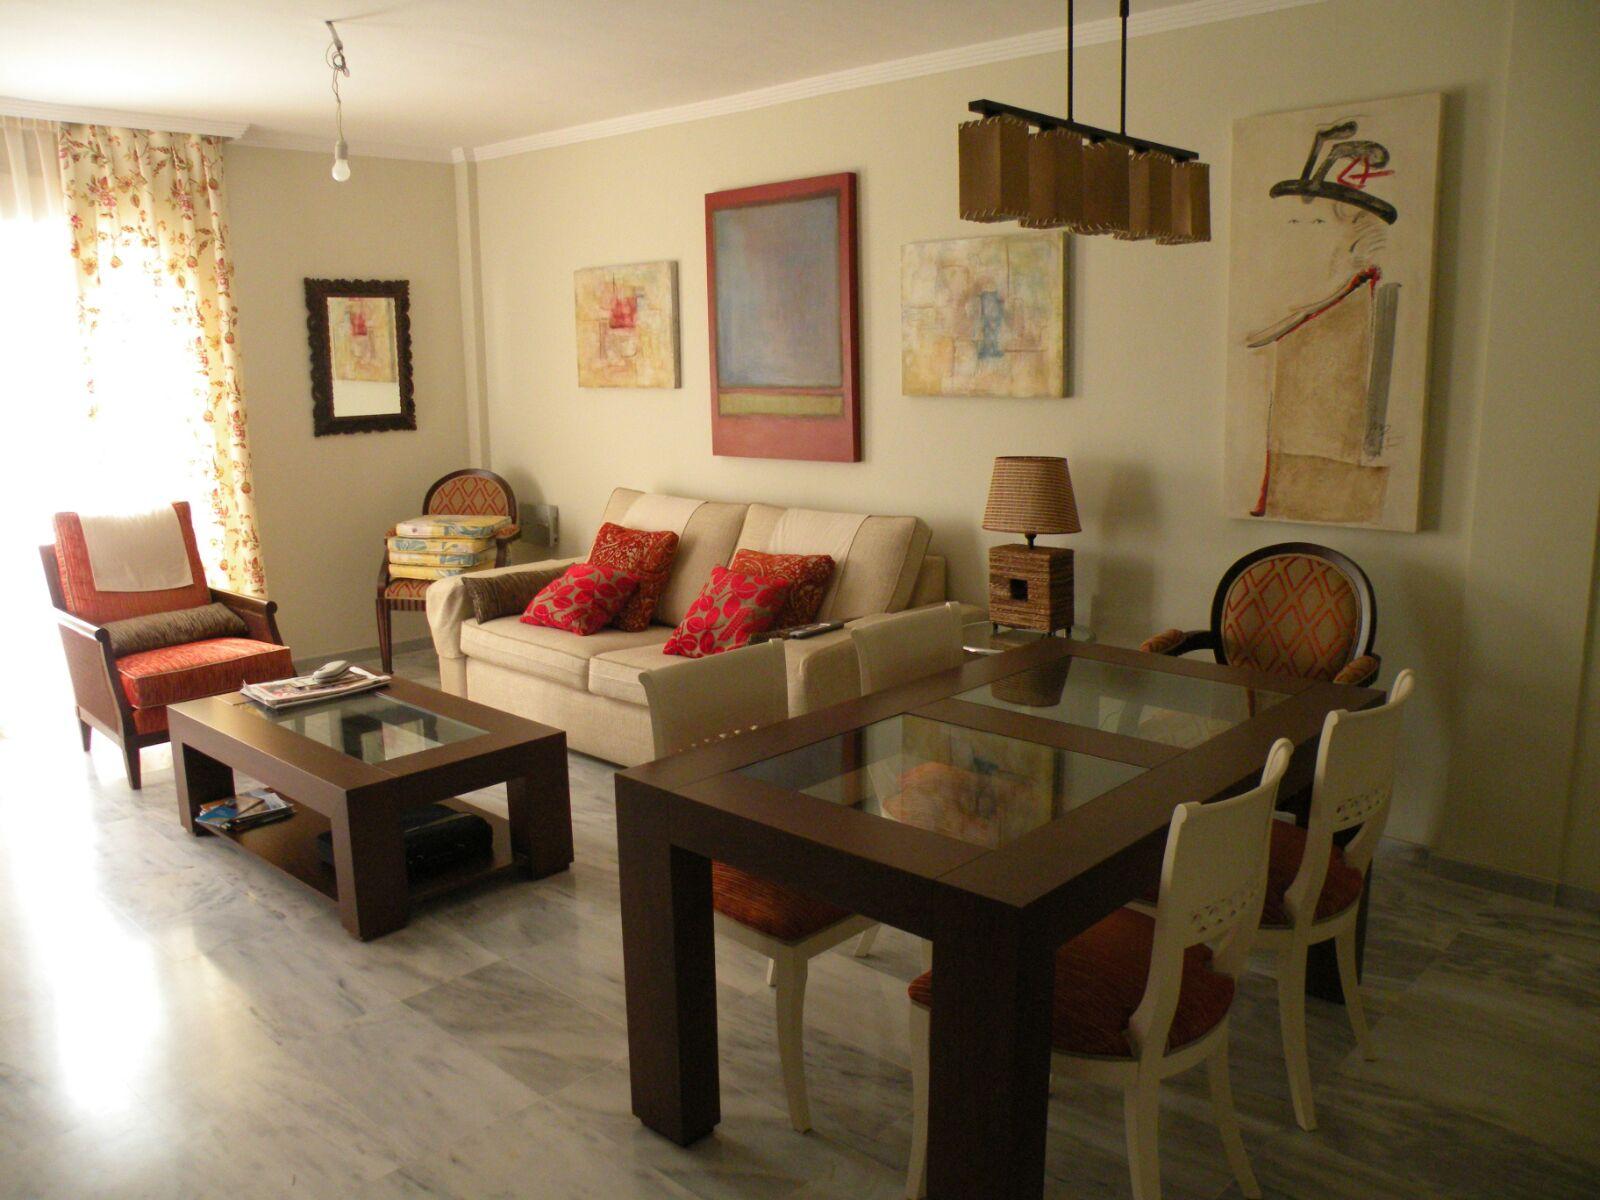 Sofas a medida 2 tapizados artesanos tapizados artesanos - Artesanos del sofa ...